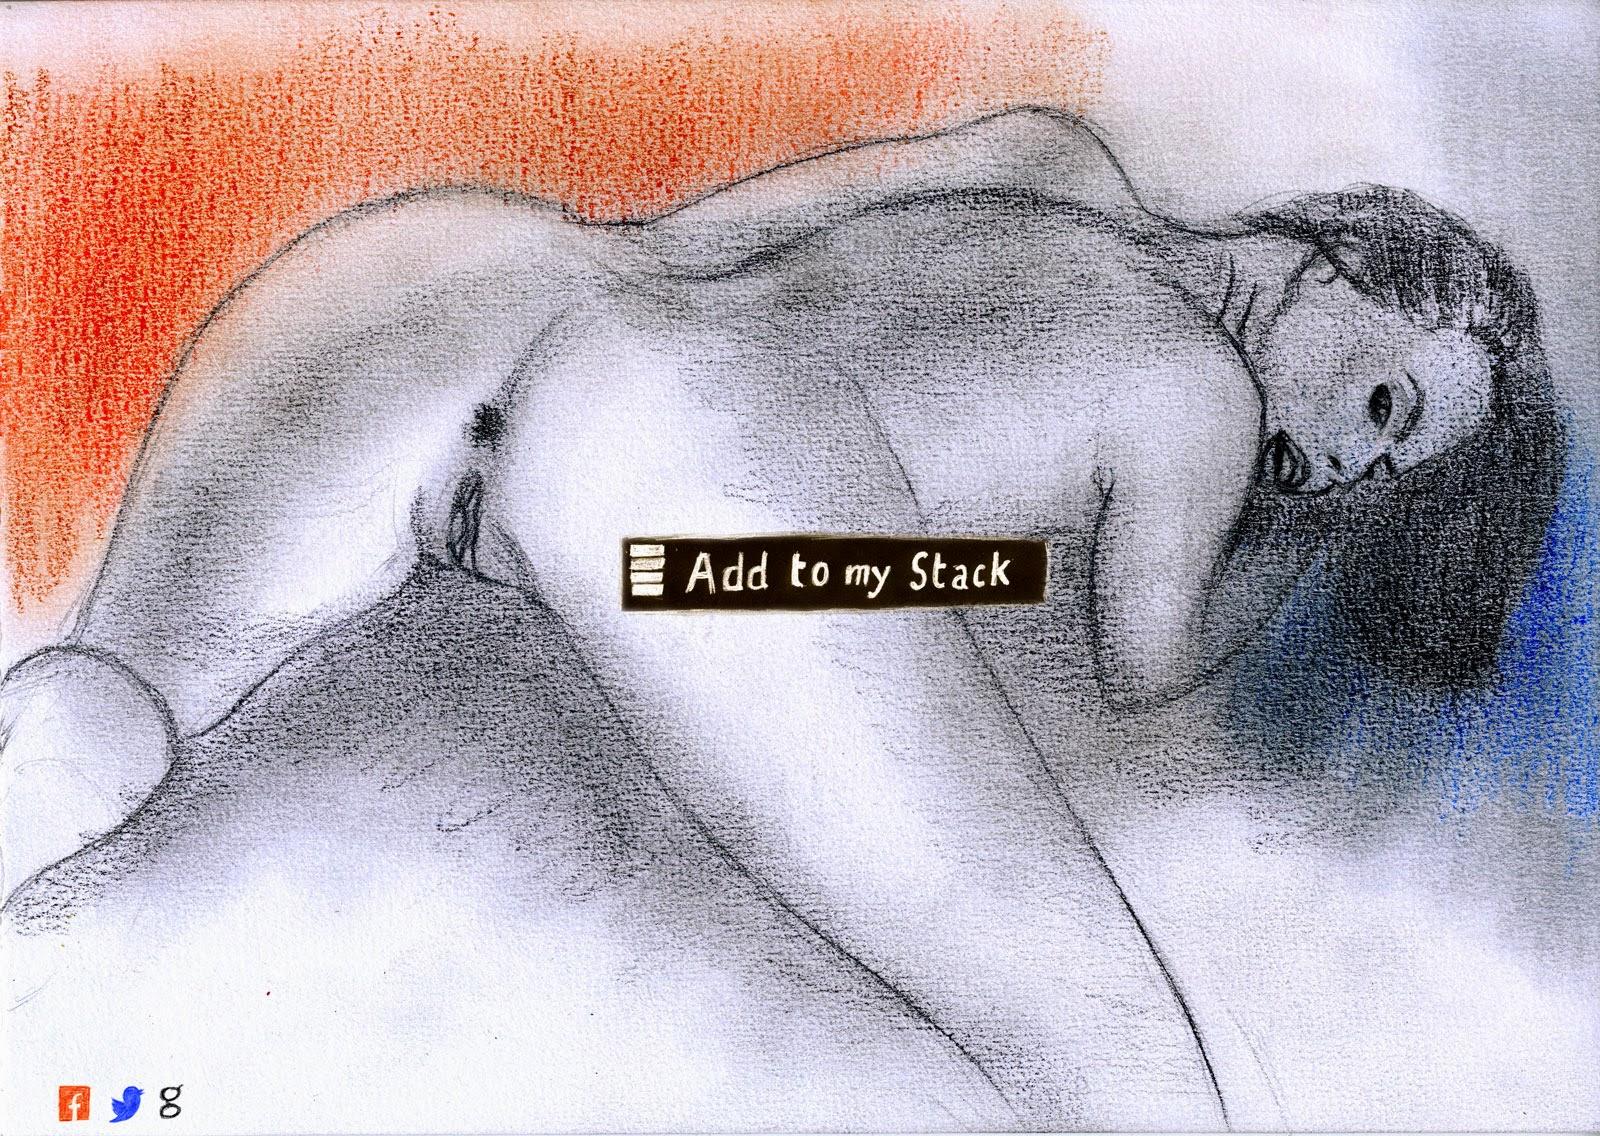 dessin erotique pornographique exhibtion sexe anus